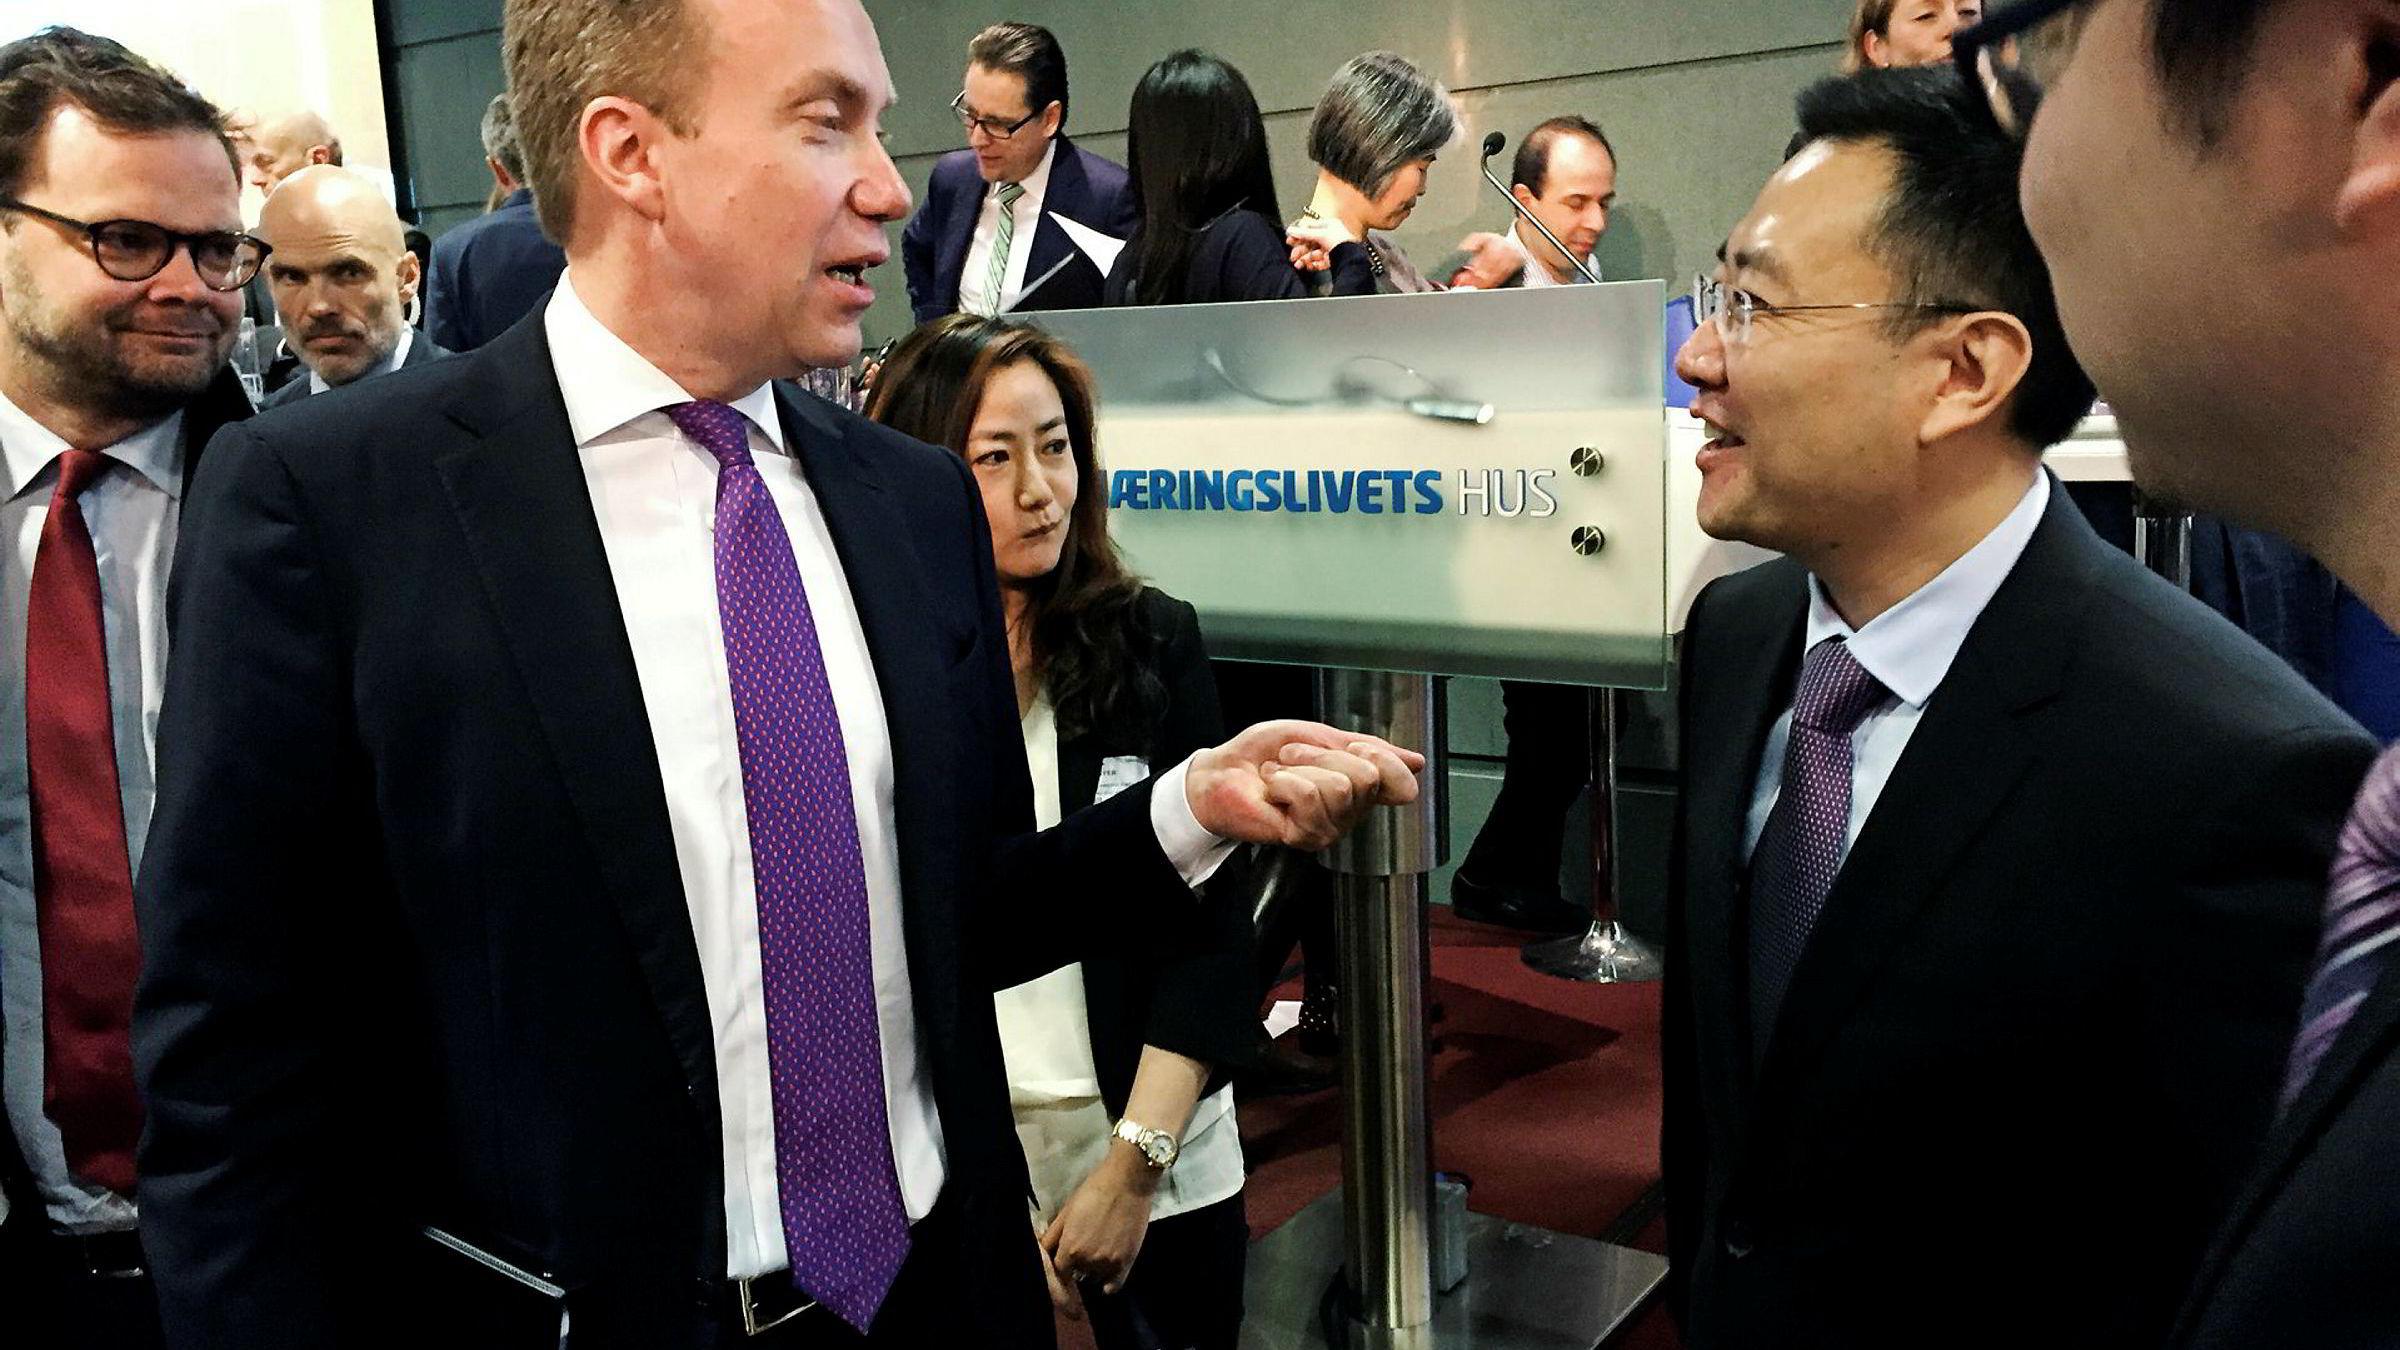 Utenriksminister Børge Brende og chargé d'affaires Dong Fengming ved Kinas ambassade i Norge på NHOs morgenkaffe om normaliseringen av forholdet mellom Norge og Kina.